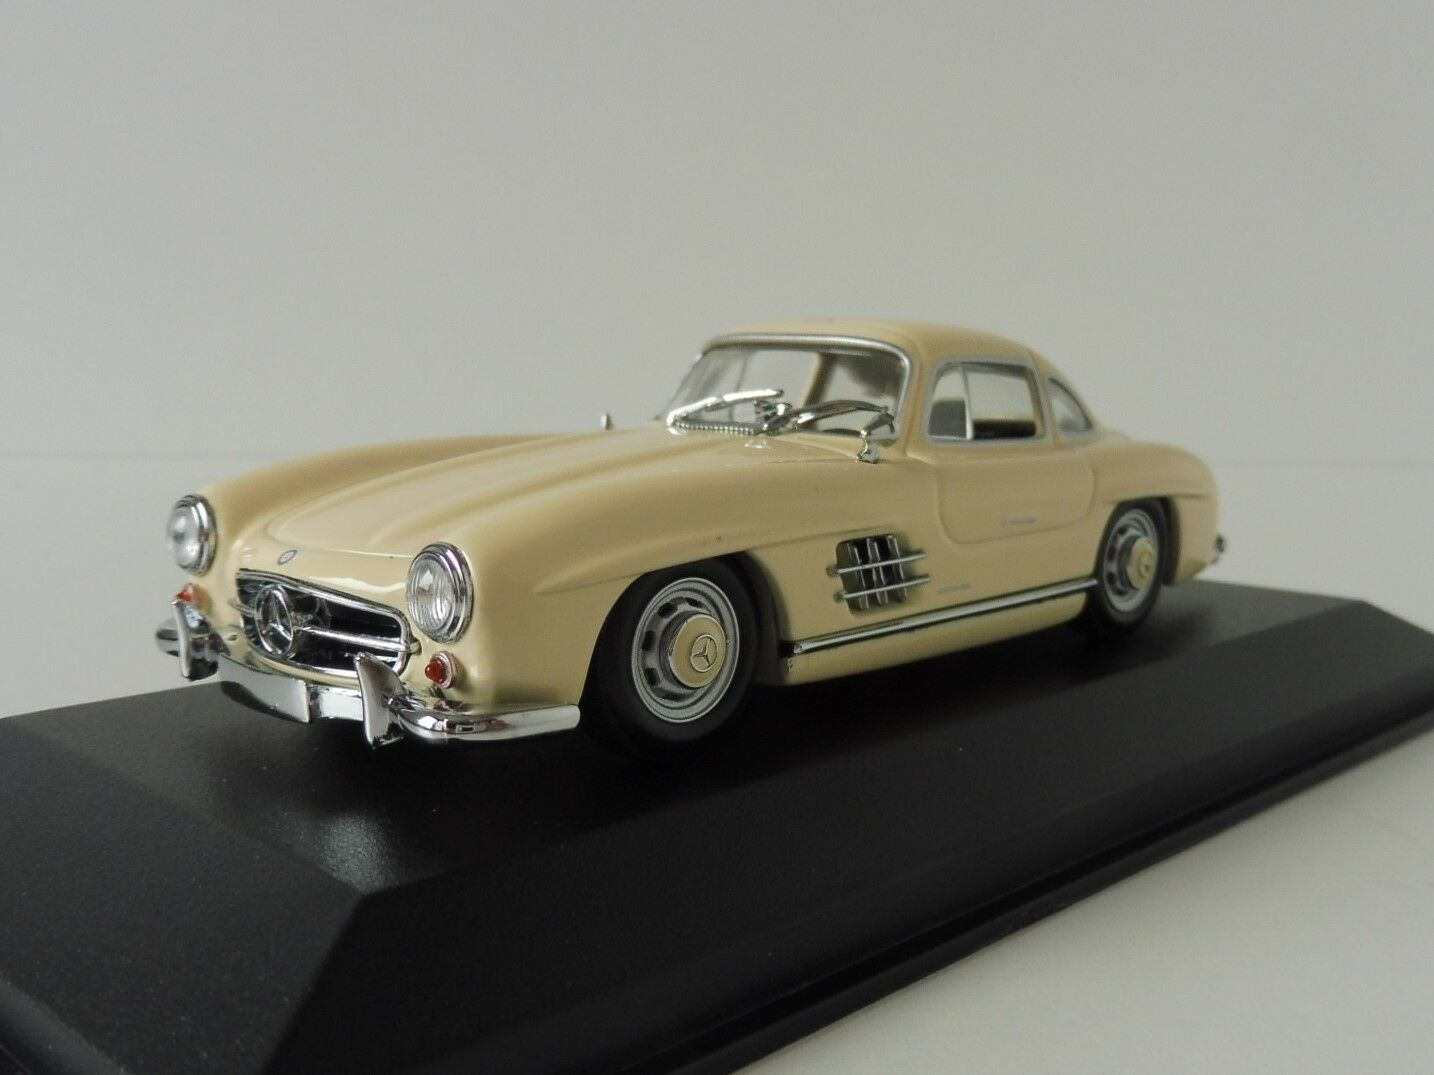 Mercedes-Benz 300 SL Coupe 1955 1 43 43 43 Maxichamps 940039002 by Minichamps White cd8e67